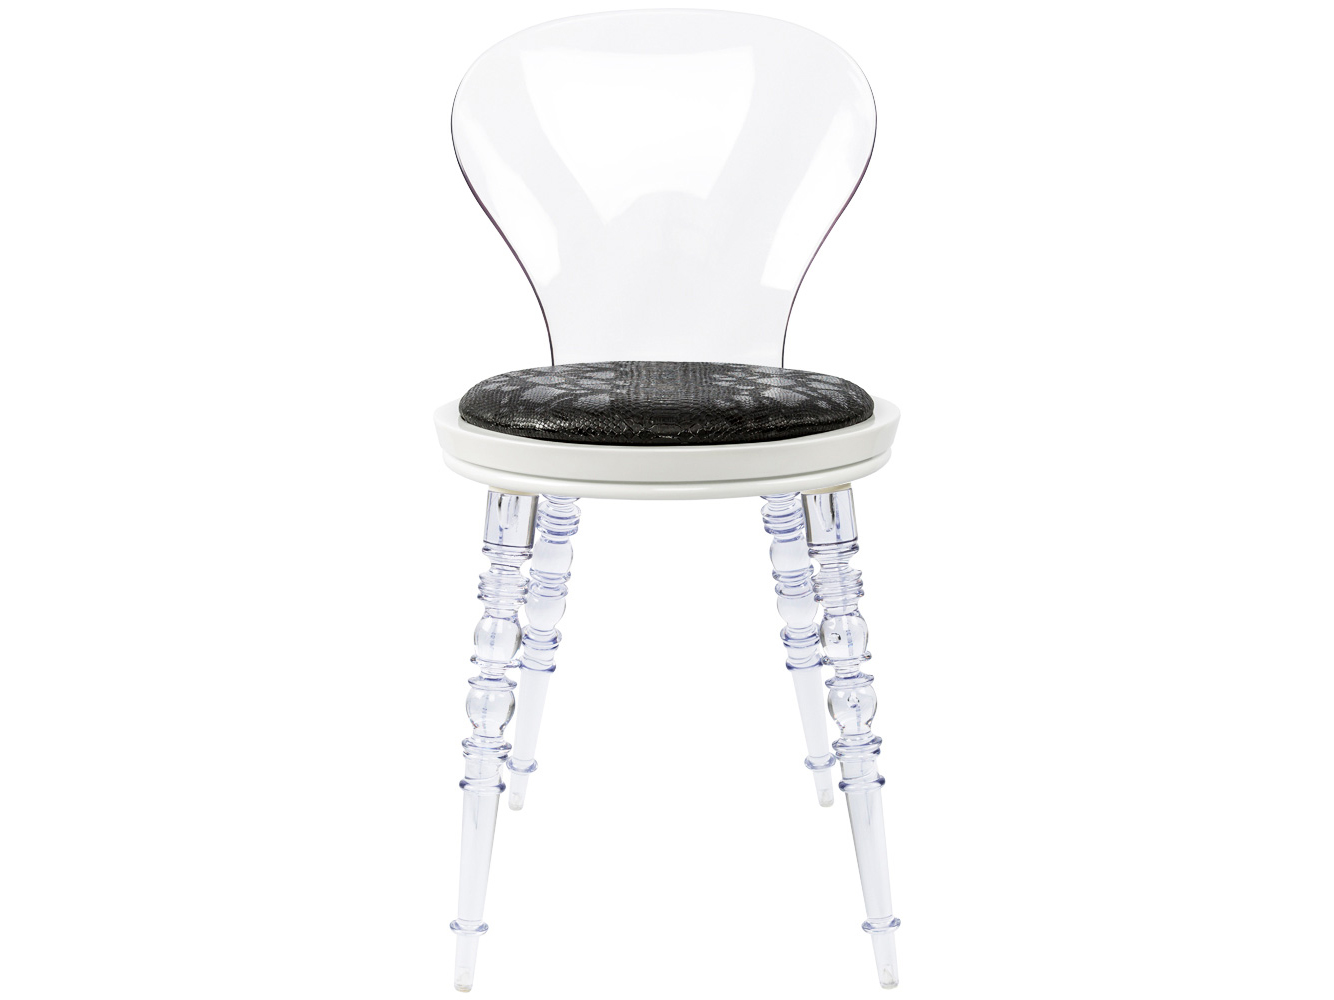 Кухонный стул Object Desire 15435221 от thefurnish